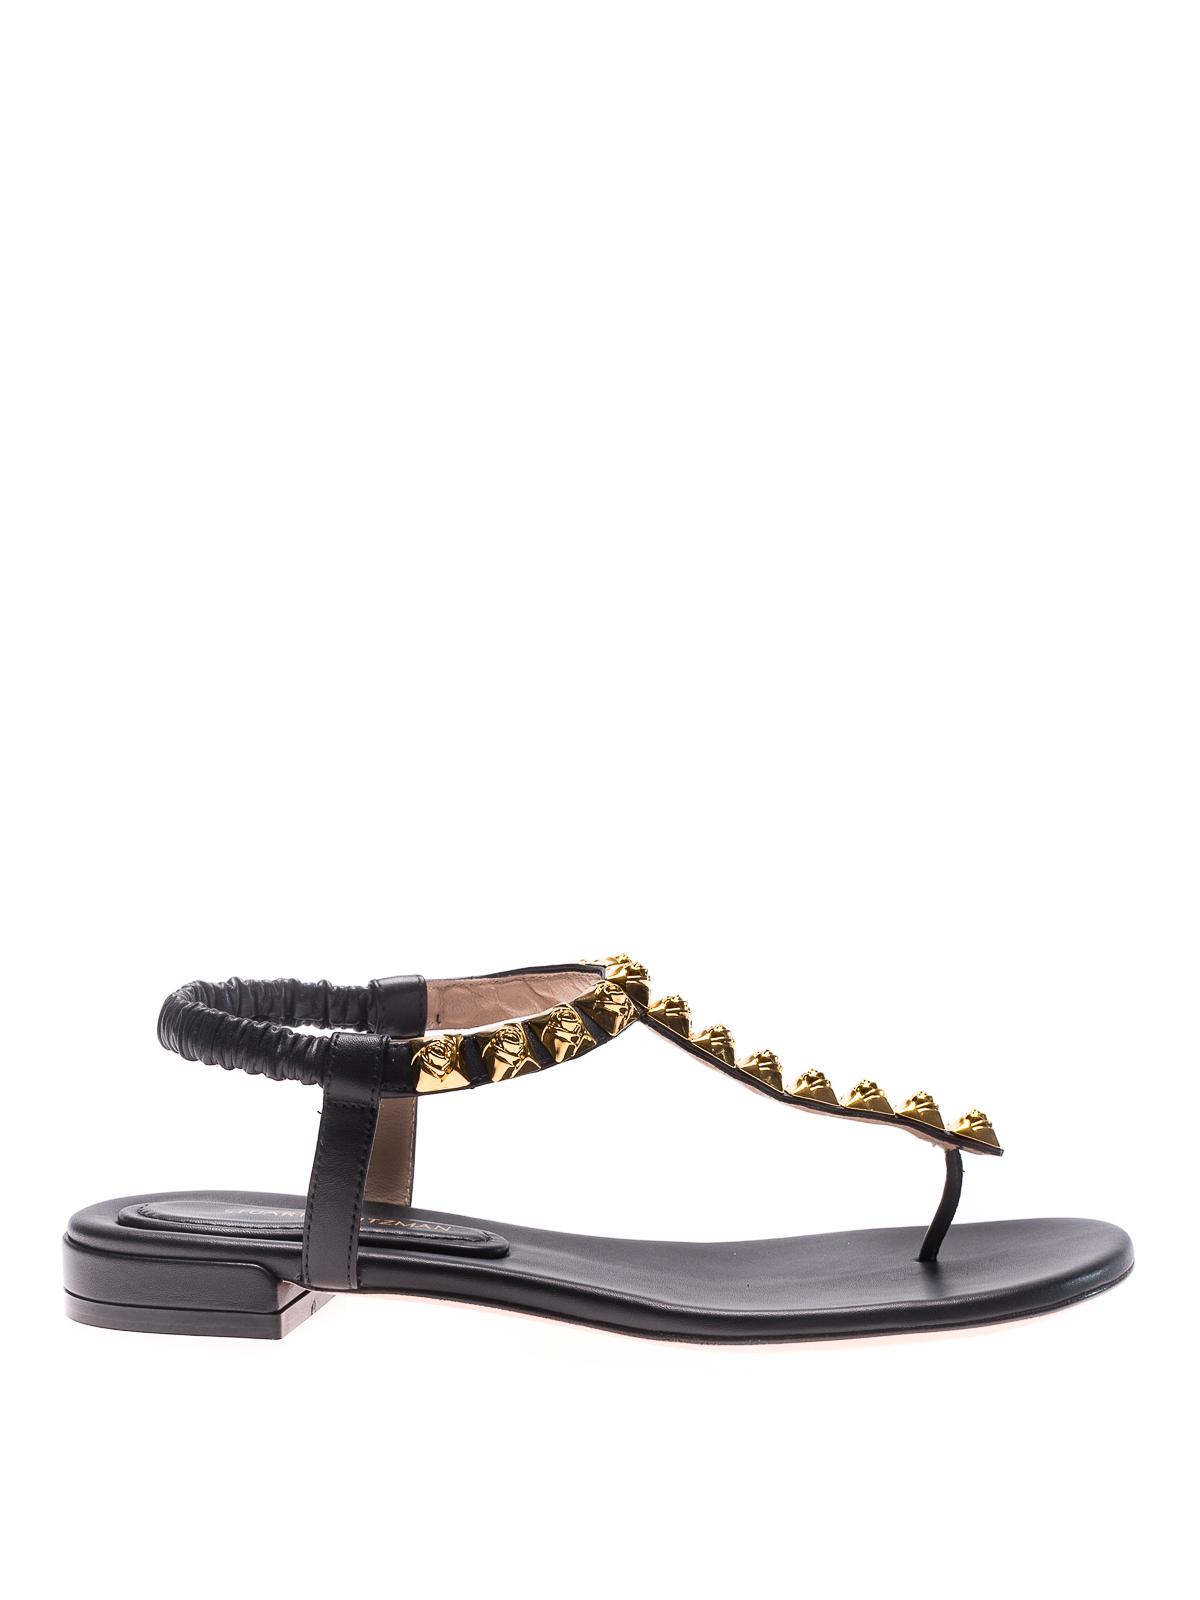 a50814eaa3b6 Stuart Weitzman - Esme thong flat sandals - sandals - ESME BLACK